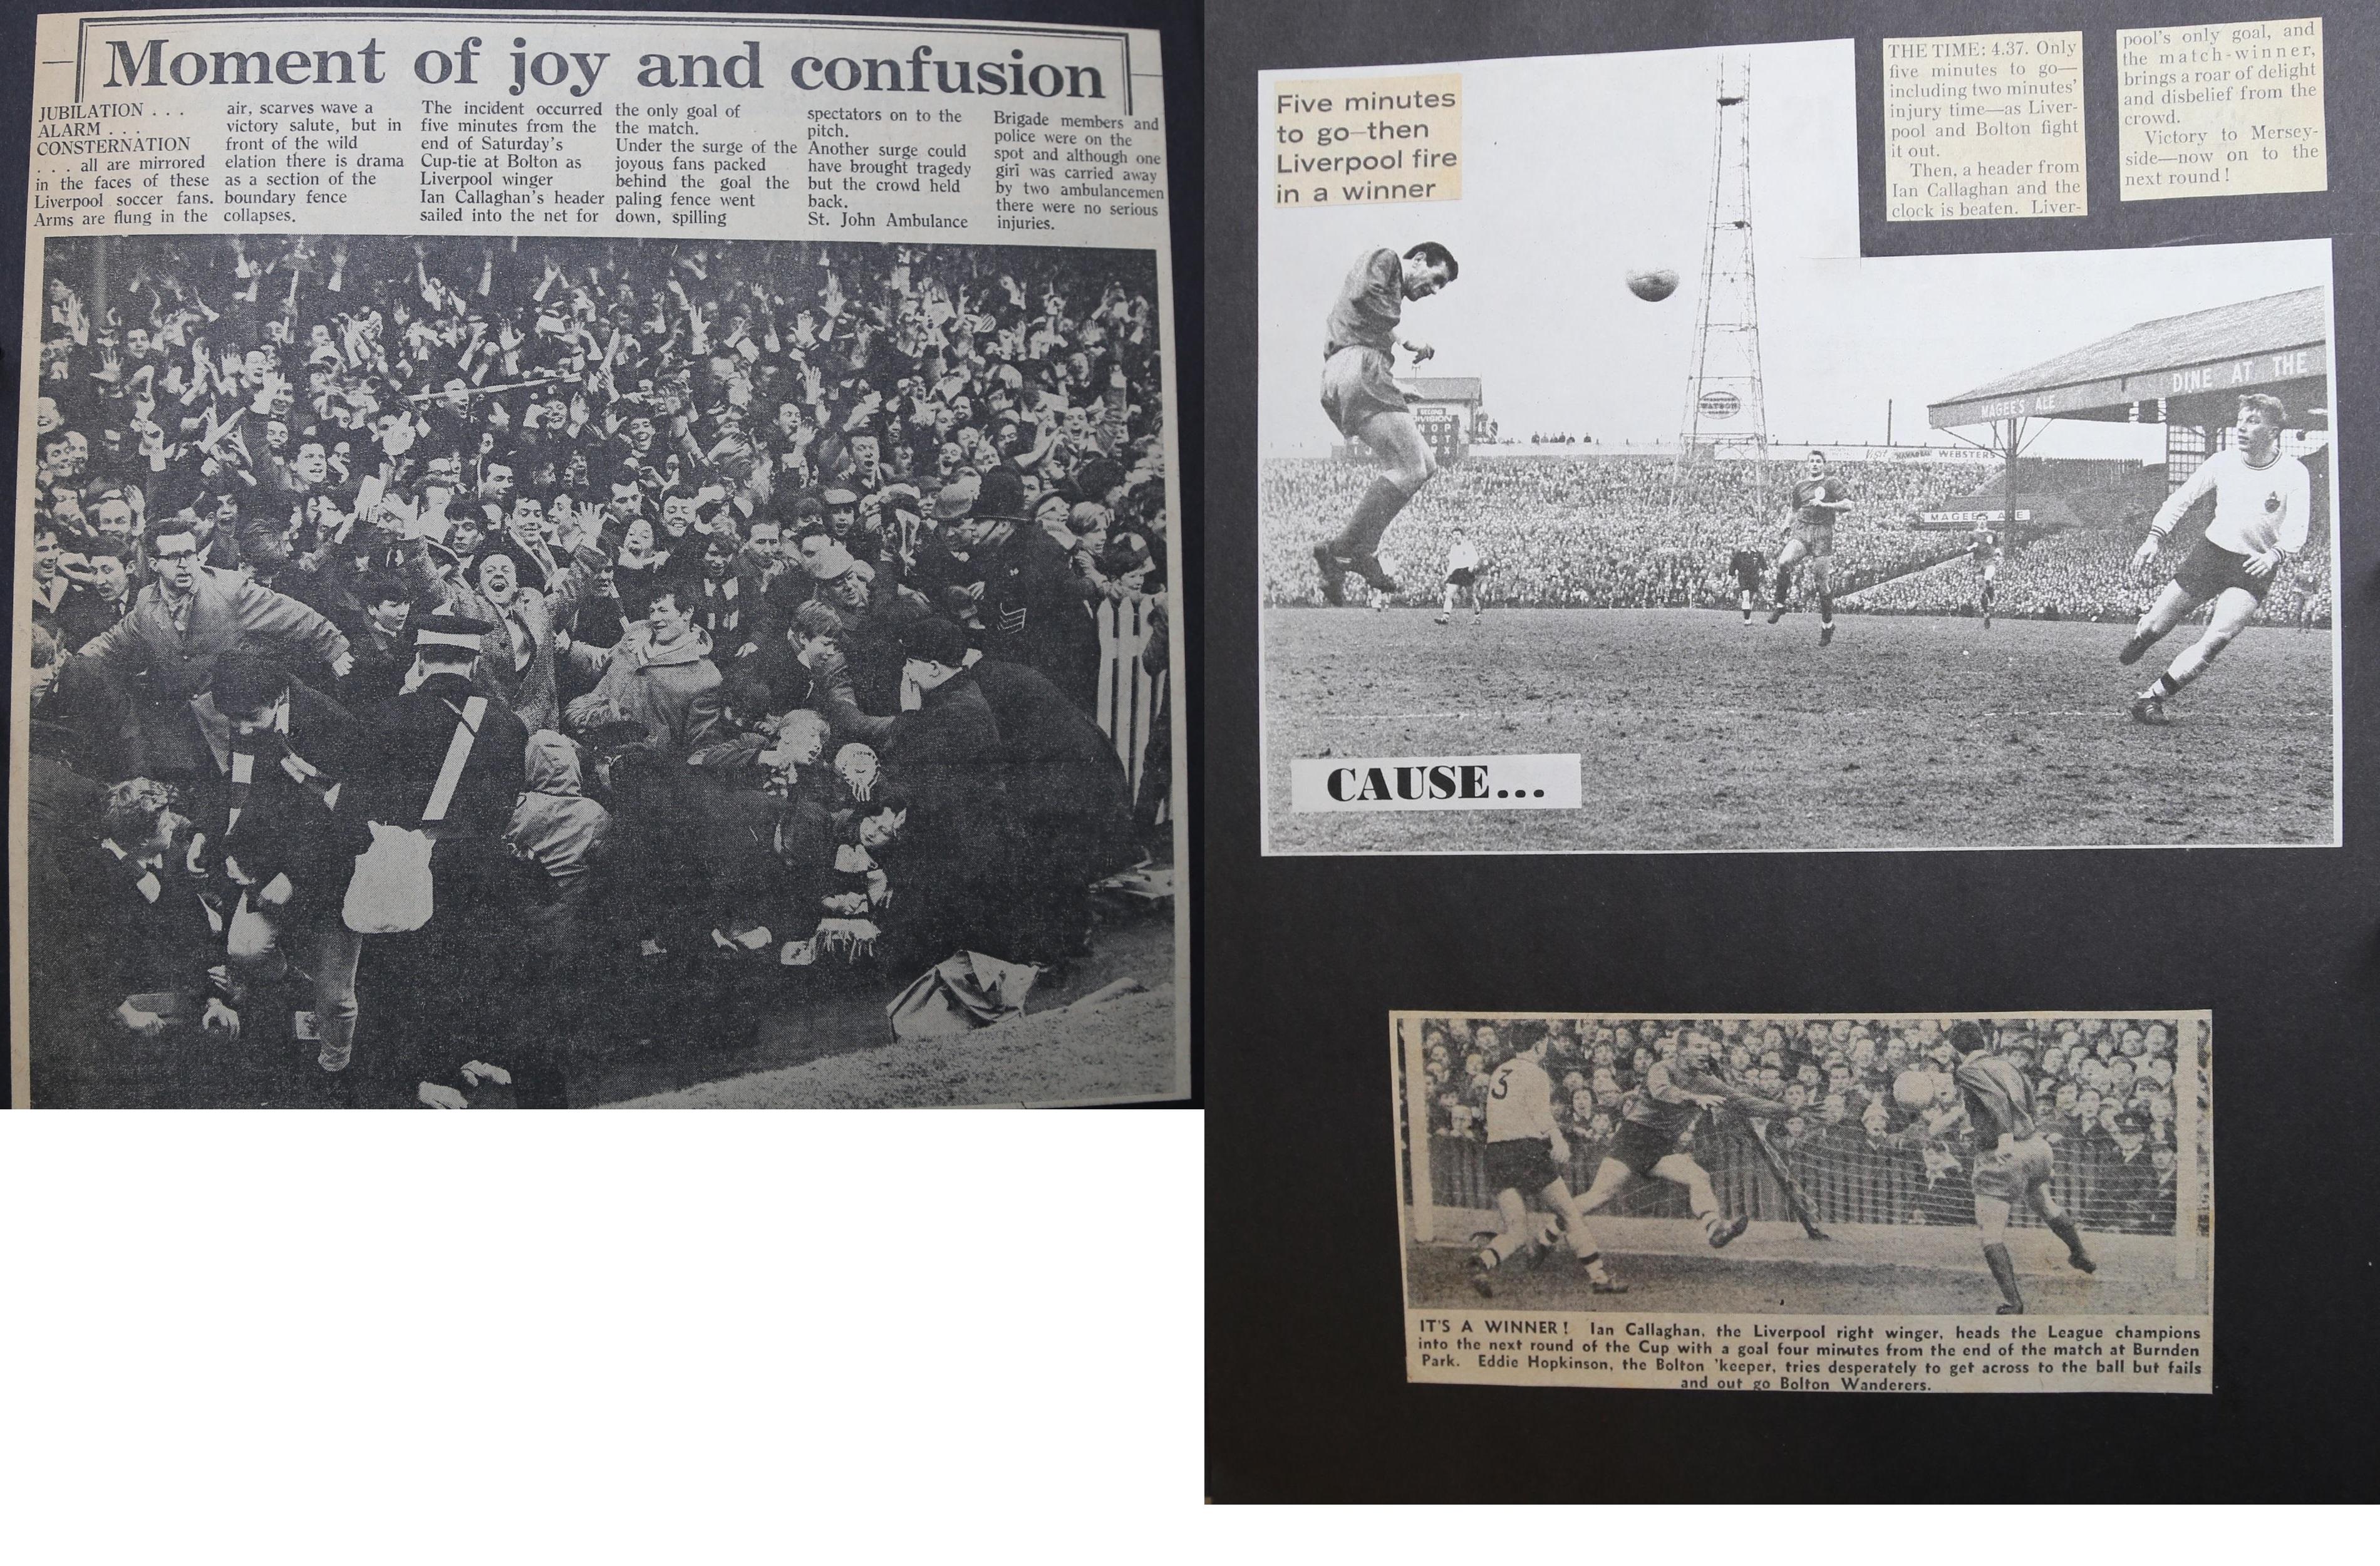 1965-02-20-bolton-272-image-fans.JPG